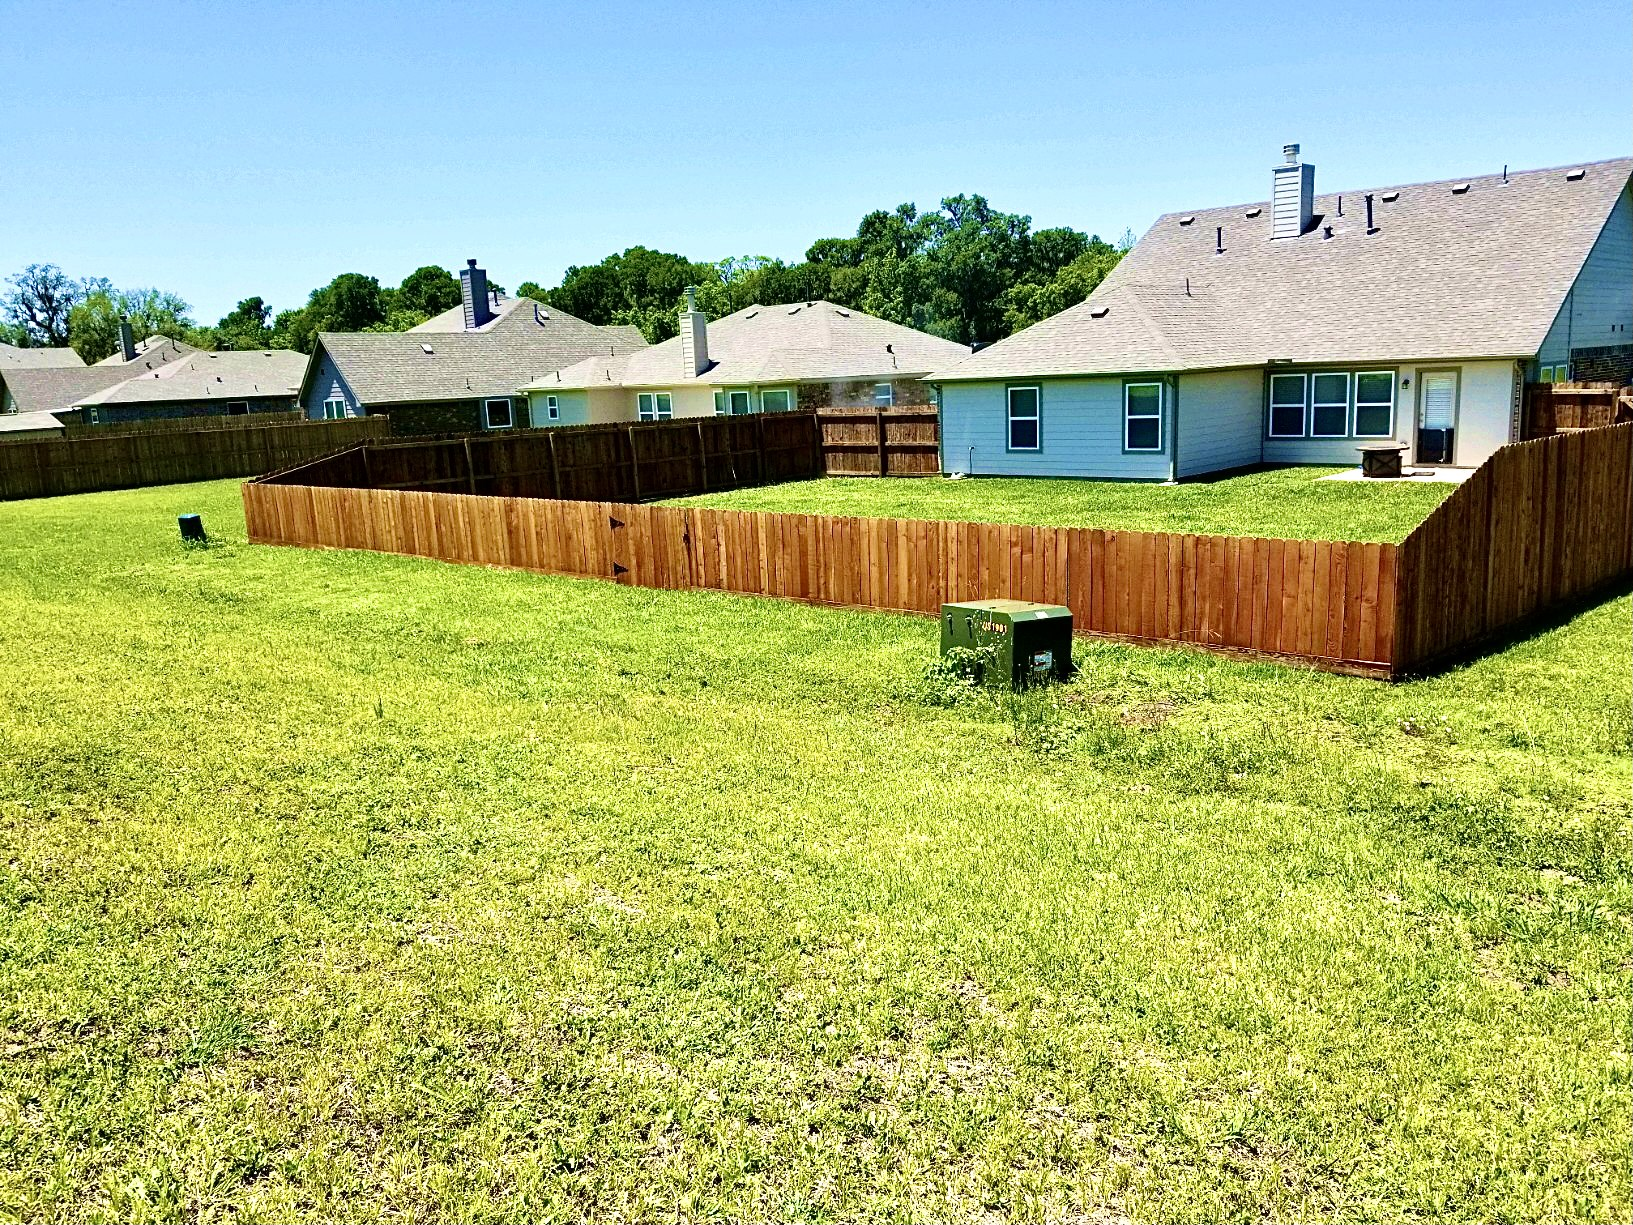 02-Fence